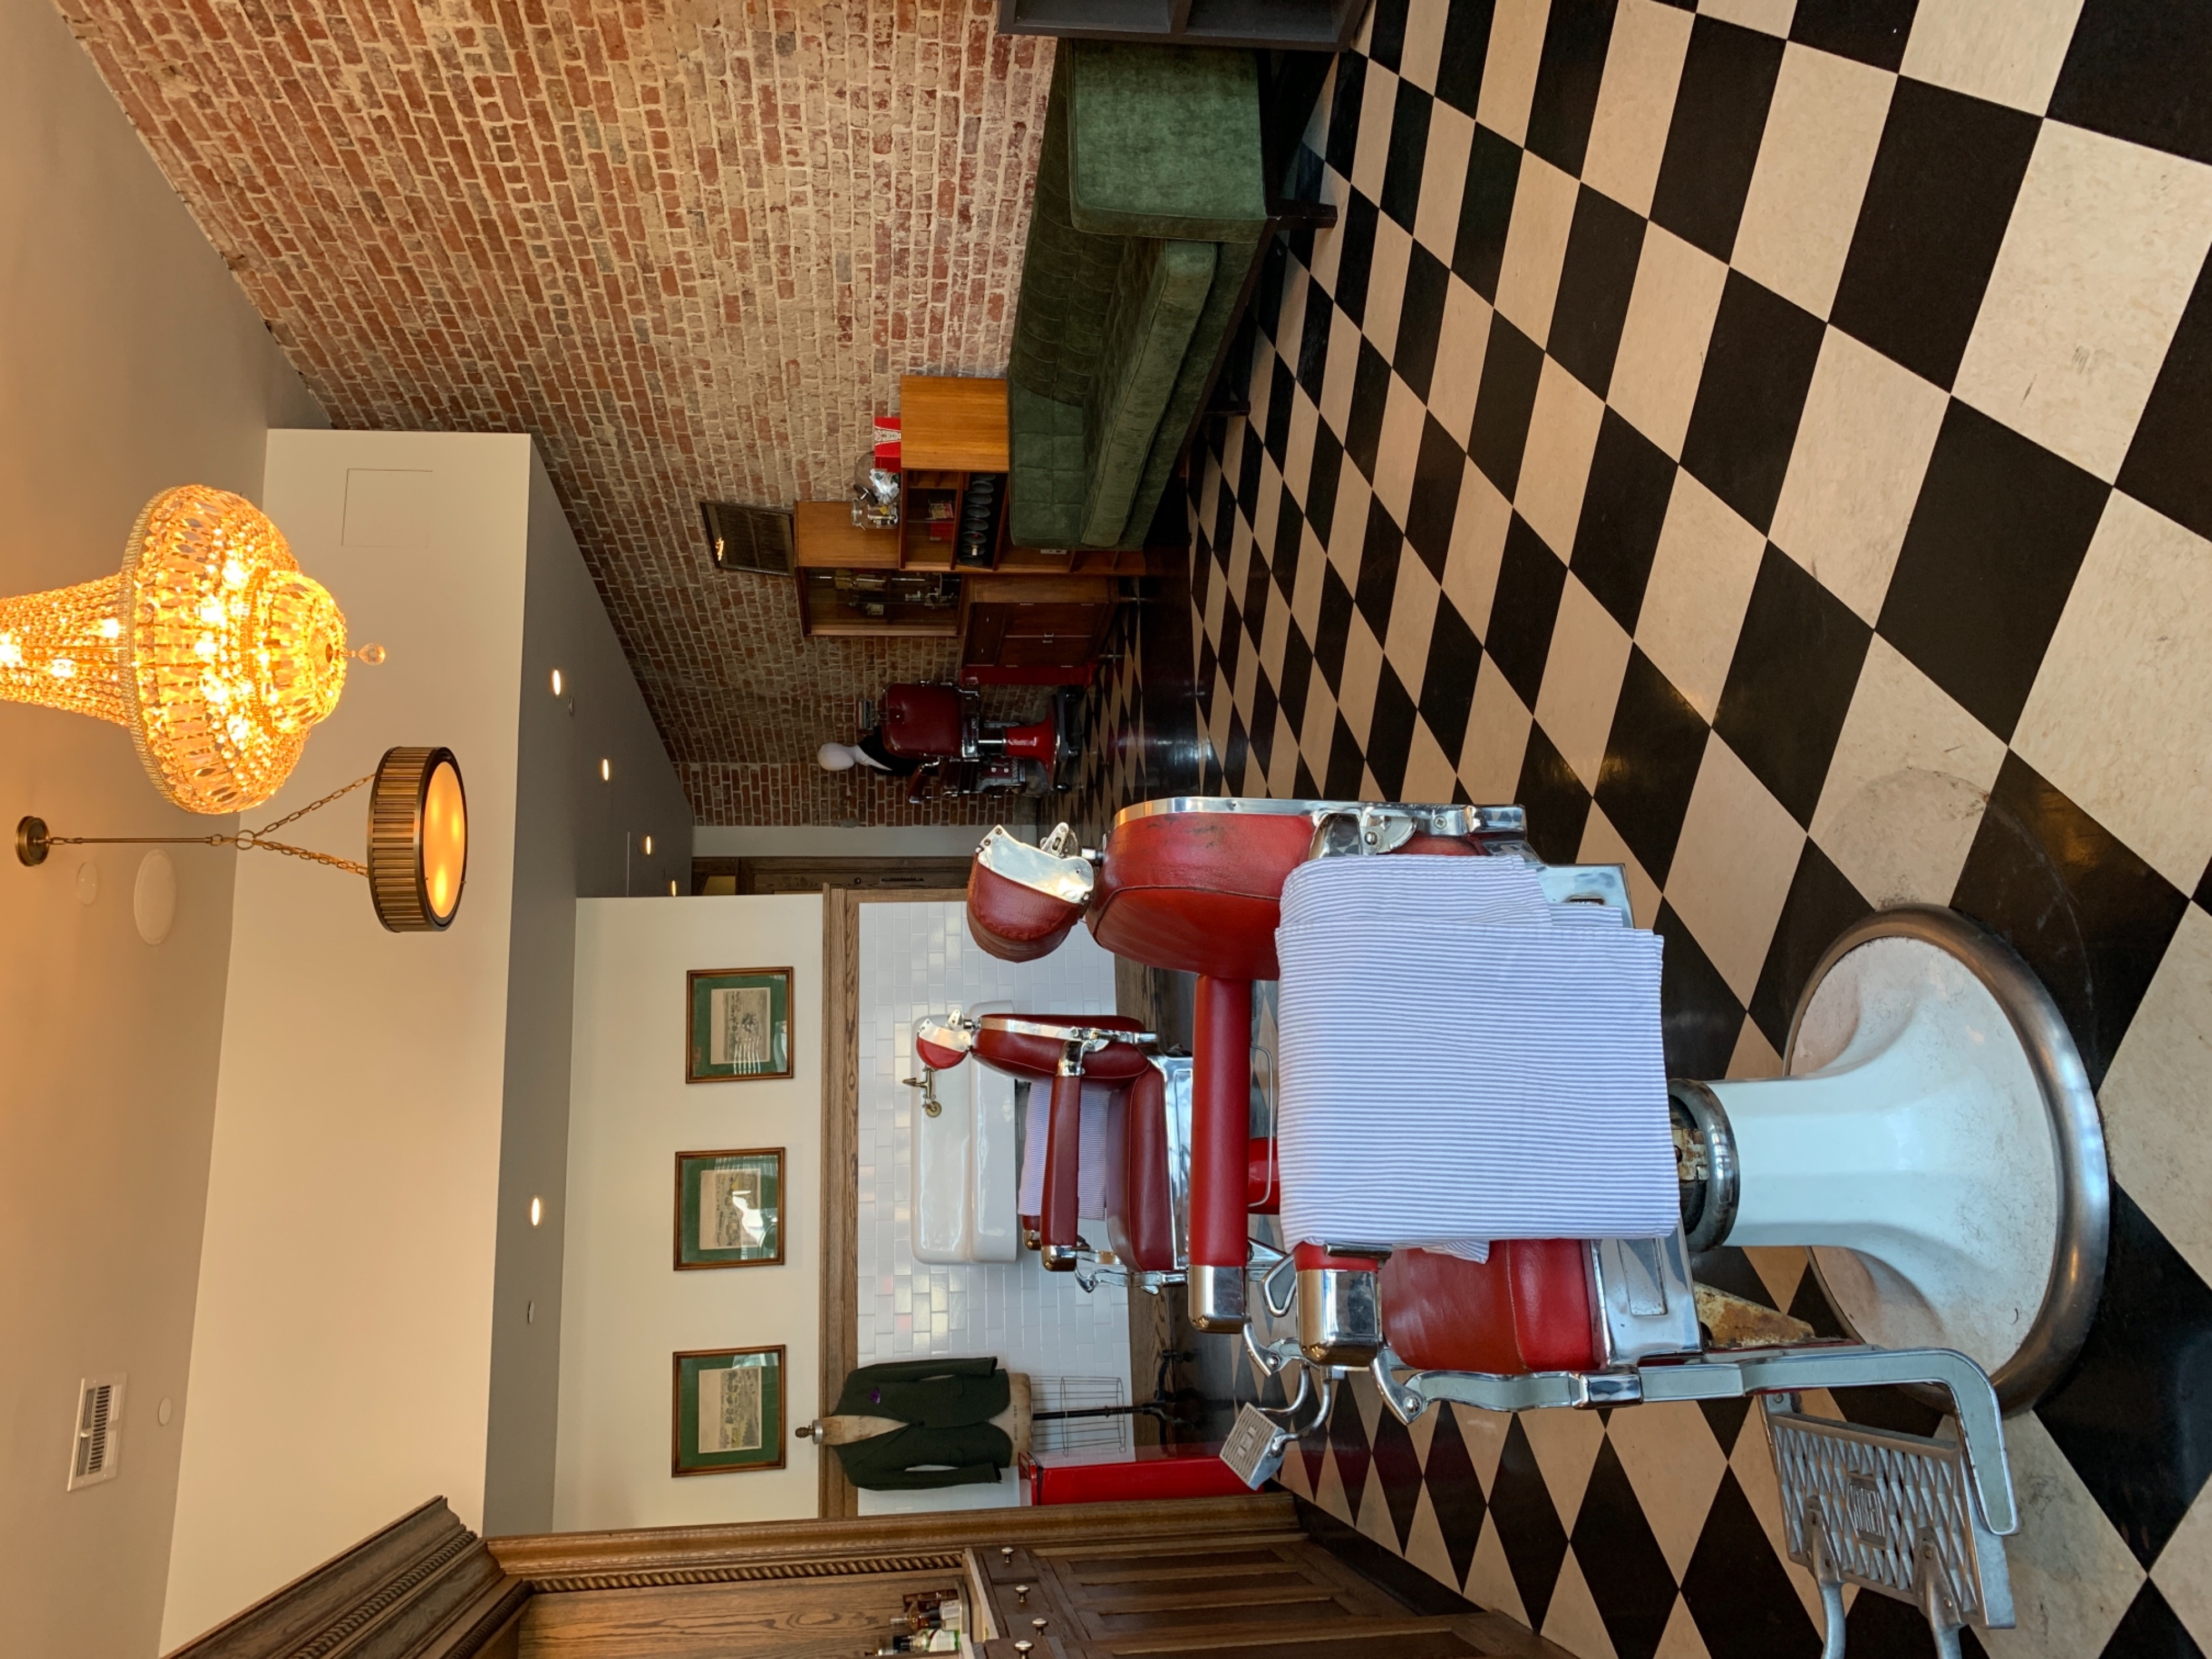 The Barbershop Club Beautiful classic traditional barbershop , Nestled in  1920's Hotel Normandie in Koreatown Los Angeles